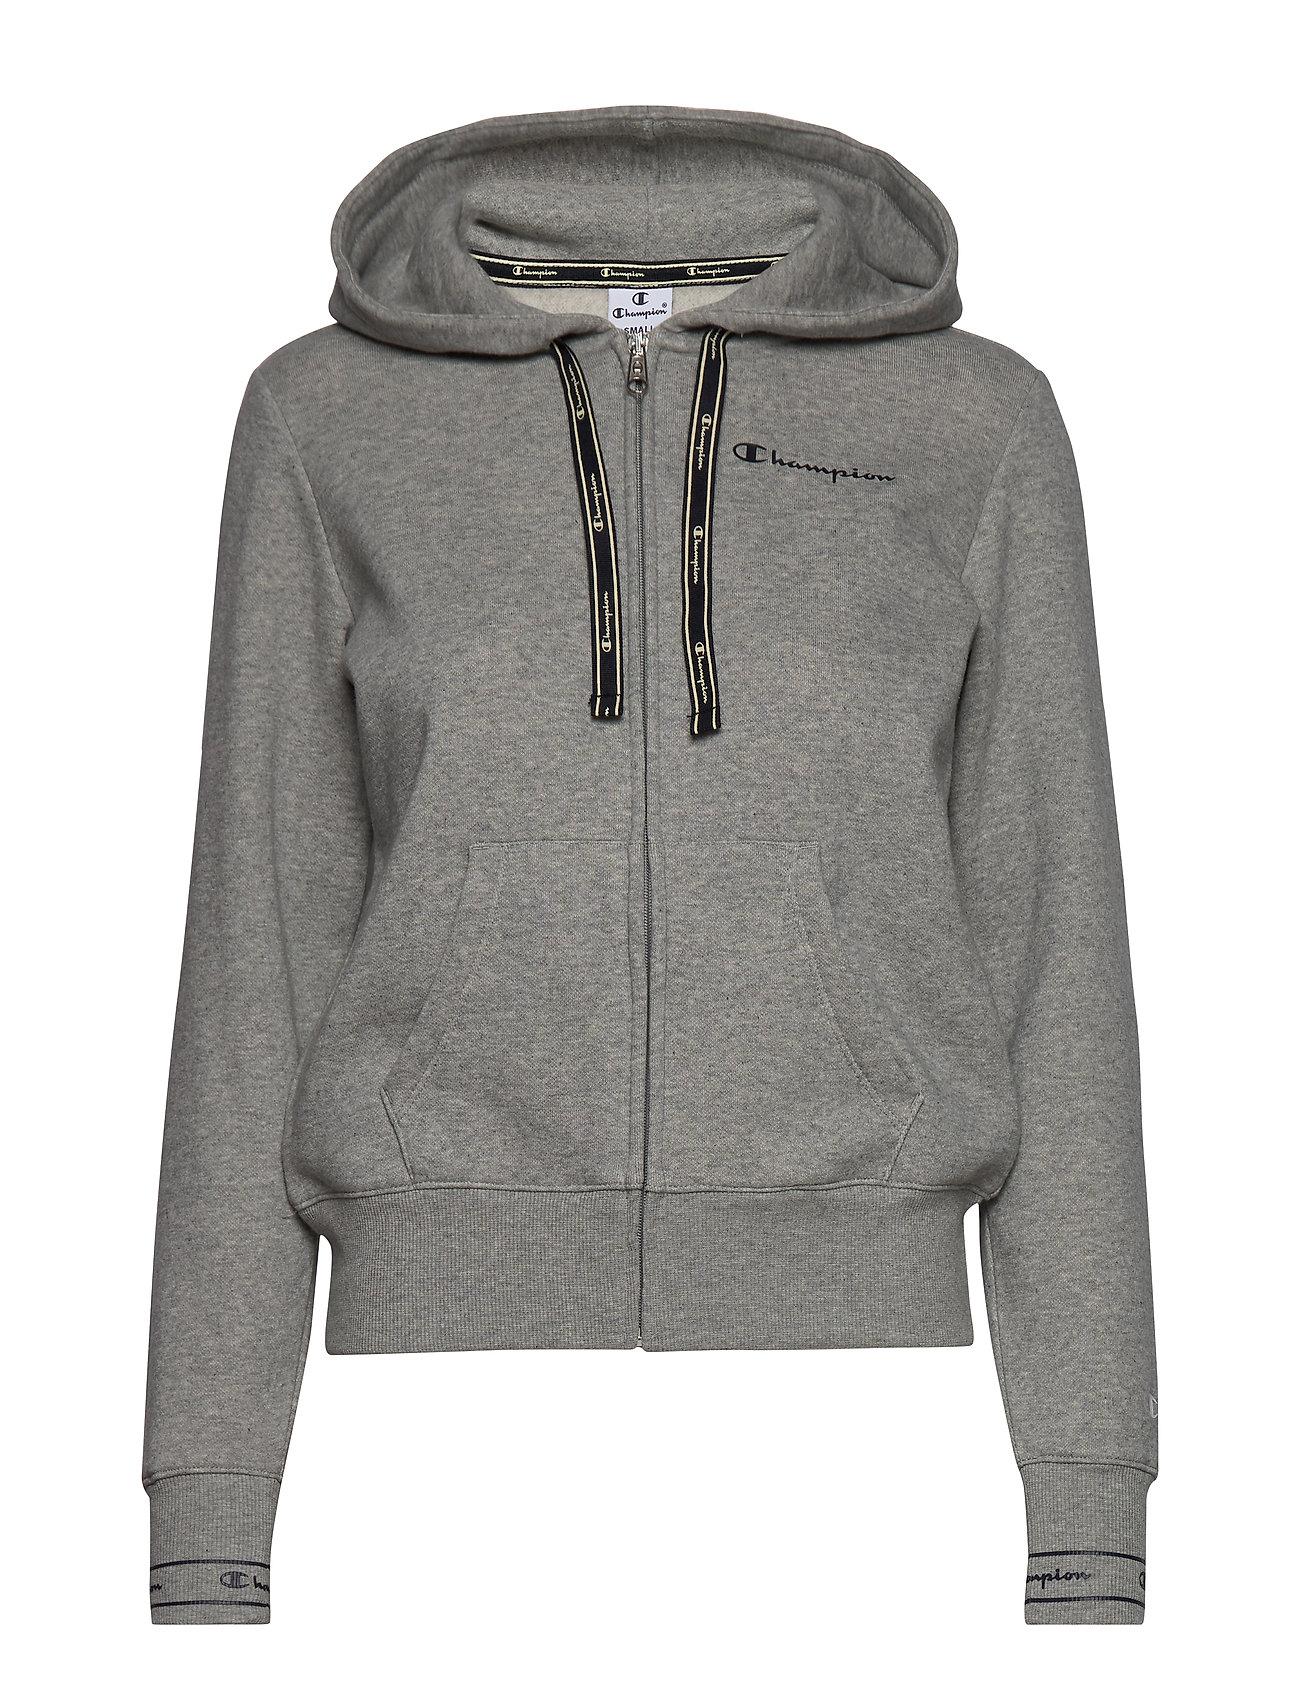 LightChampion Sweatshirtgray Full Zip Hooded Melange LqRj4Sc35A